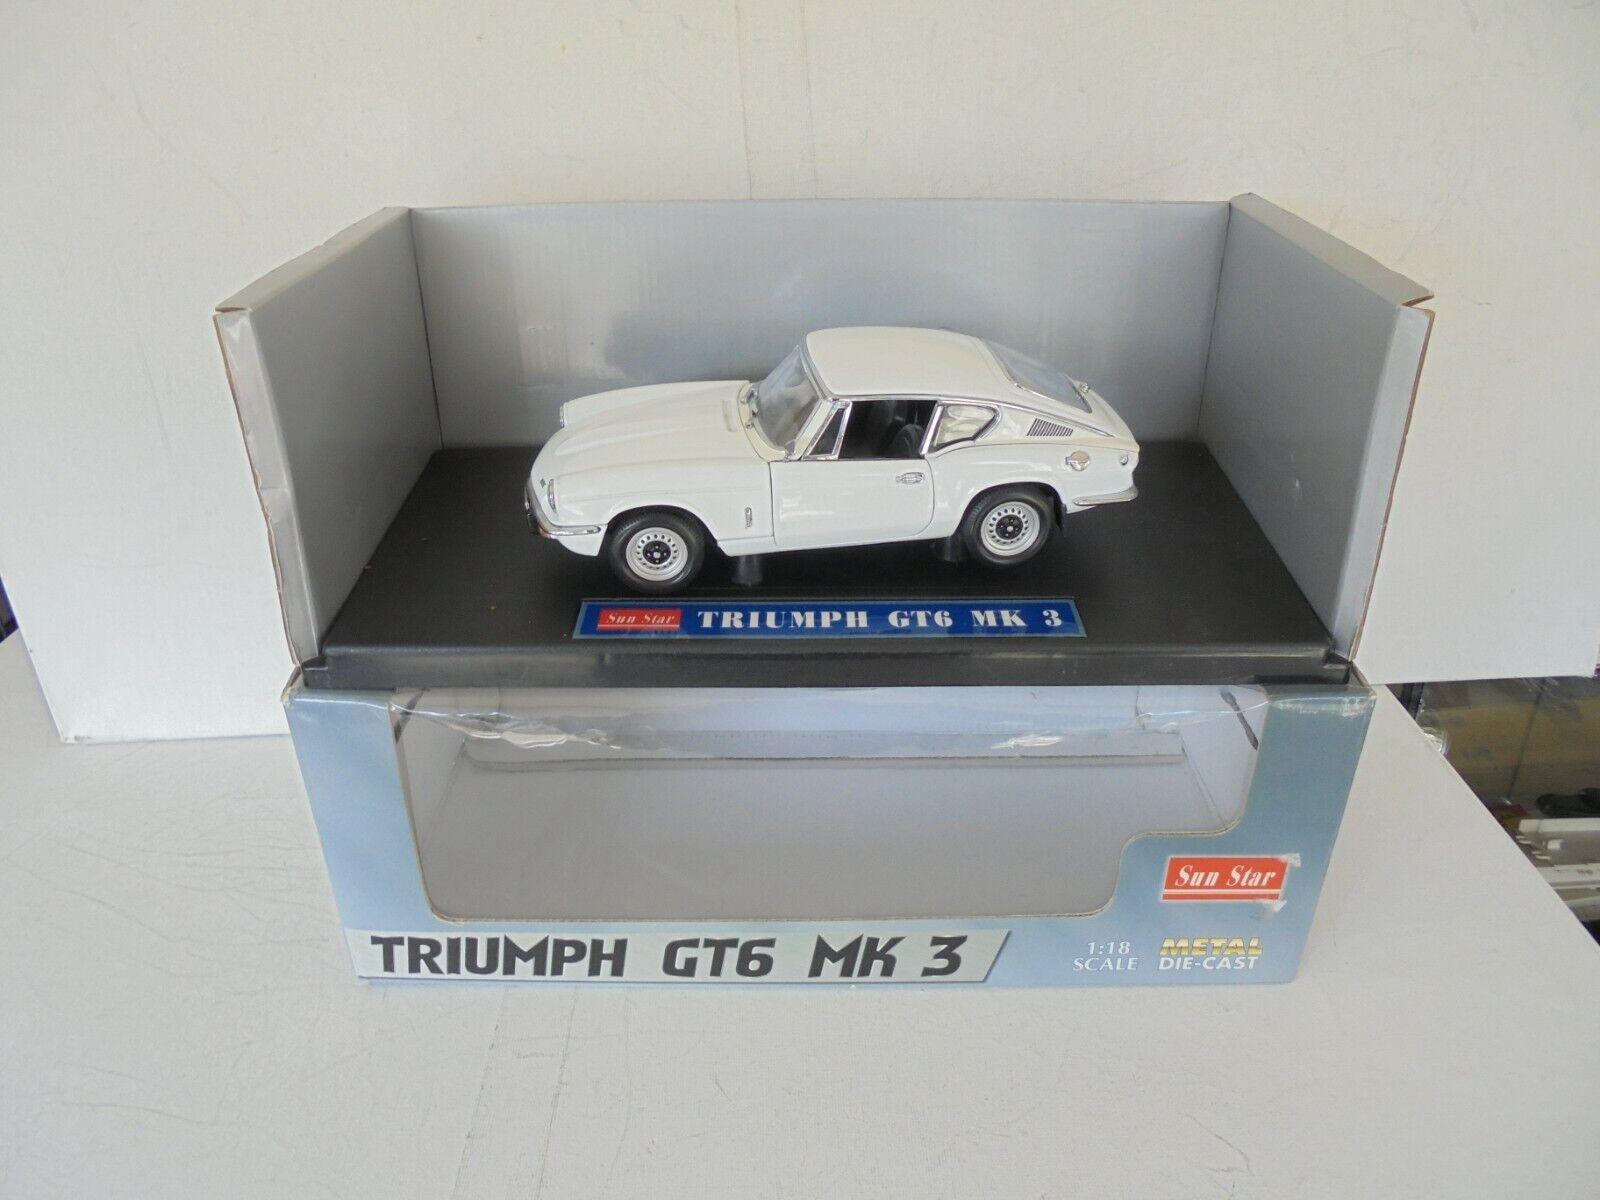 con 60% de descuento SunEstrella 1 18 Scale Diecast - - - 1057 Triumph GT6 MK3 blanco N Mint  IN box  promocionales de incentivo